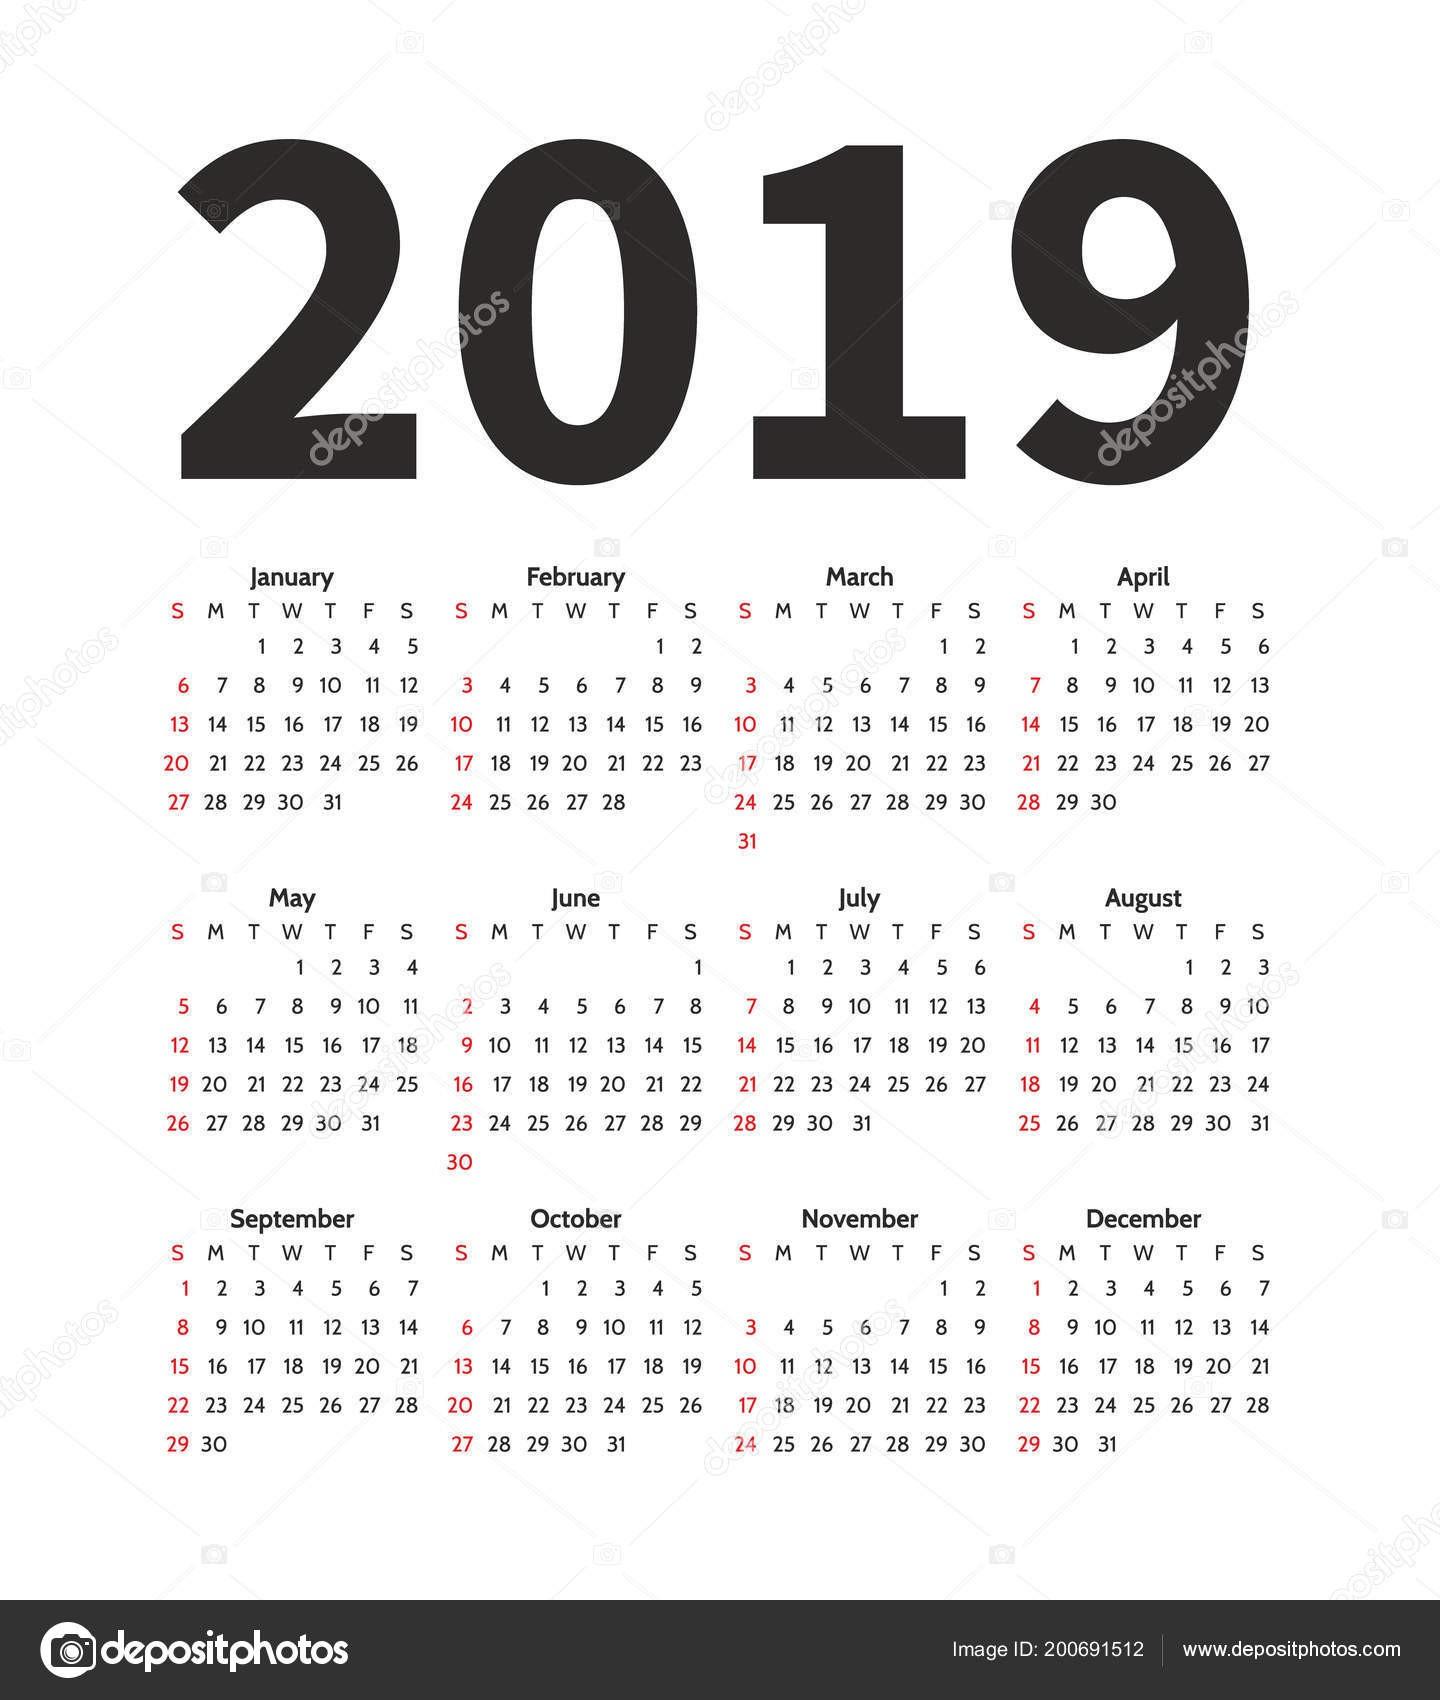 depositphotos stock illustration calendar 2019 year vector design